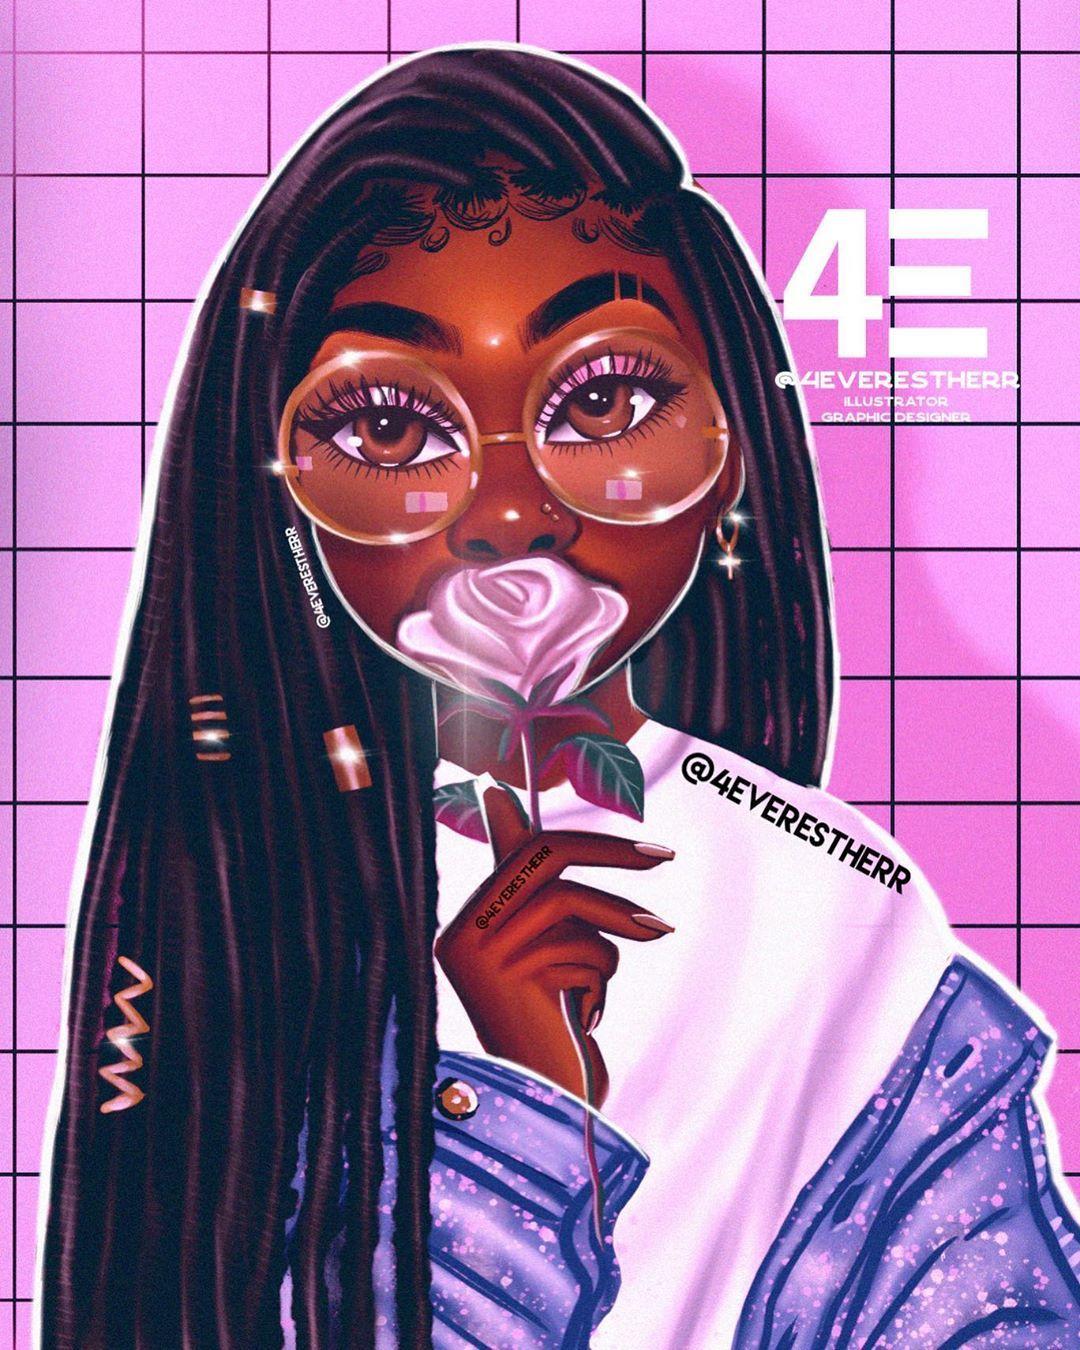 Estherr Luntadila On Instagram Lissa Illustration Drawing Art Artist Dreads Drea Black Girl Cartoon Drawings Of Black Girls Black Girl Art